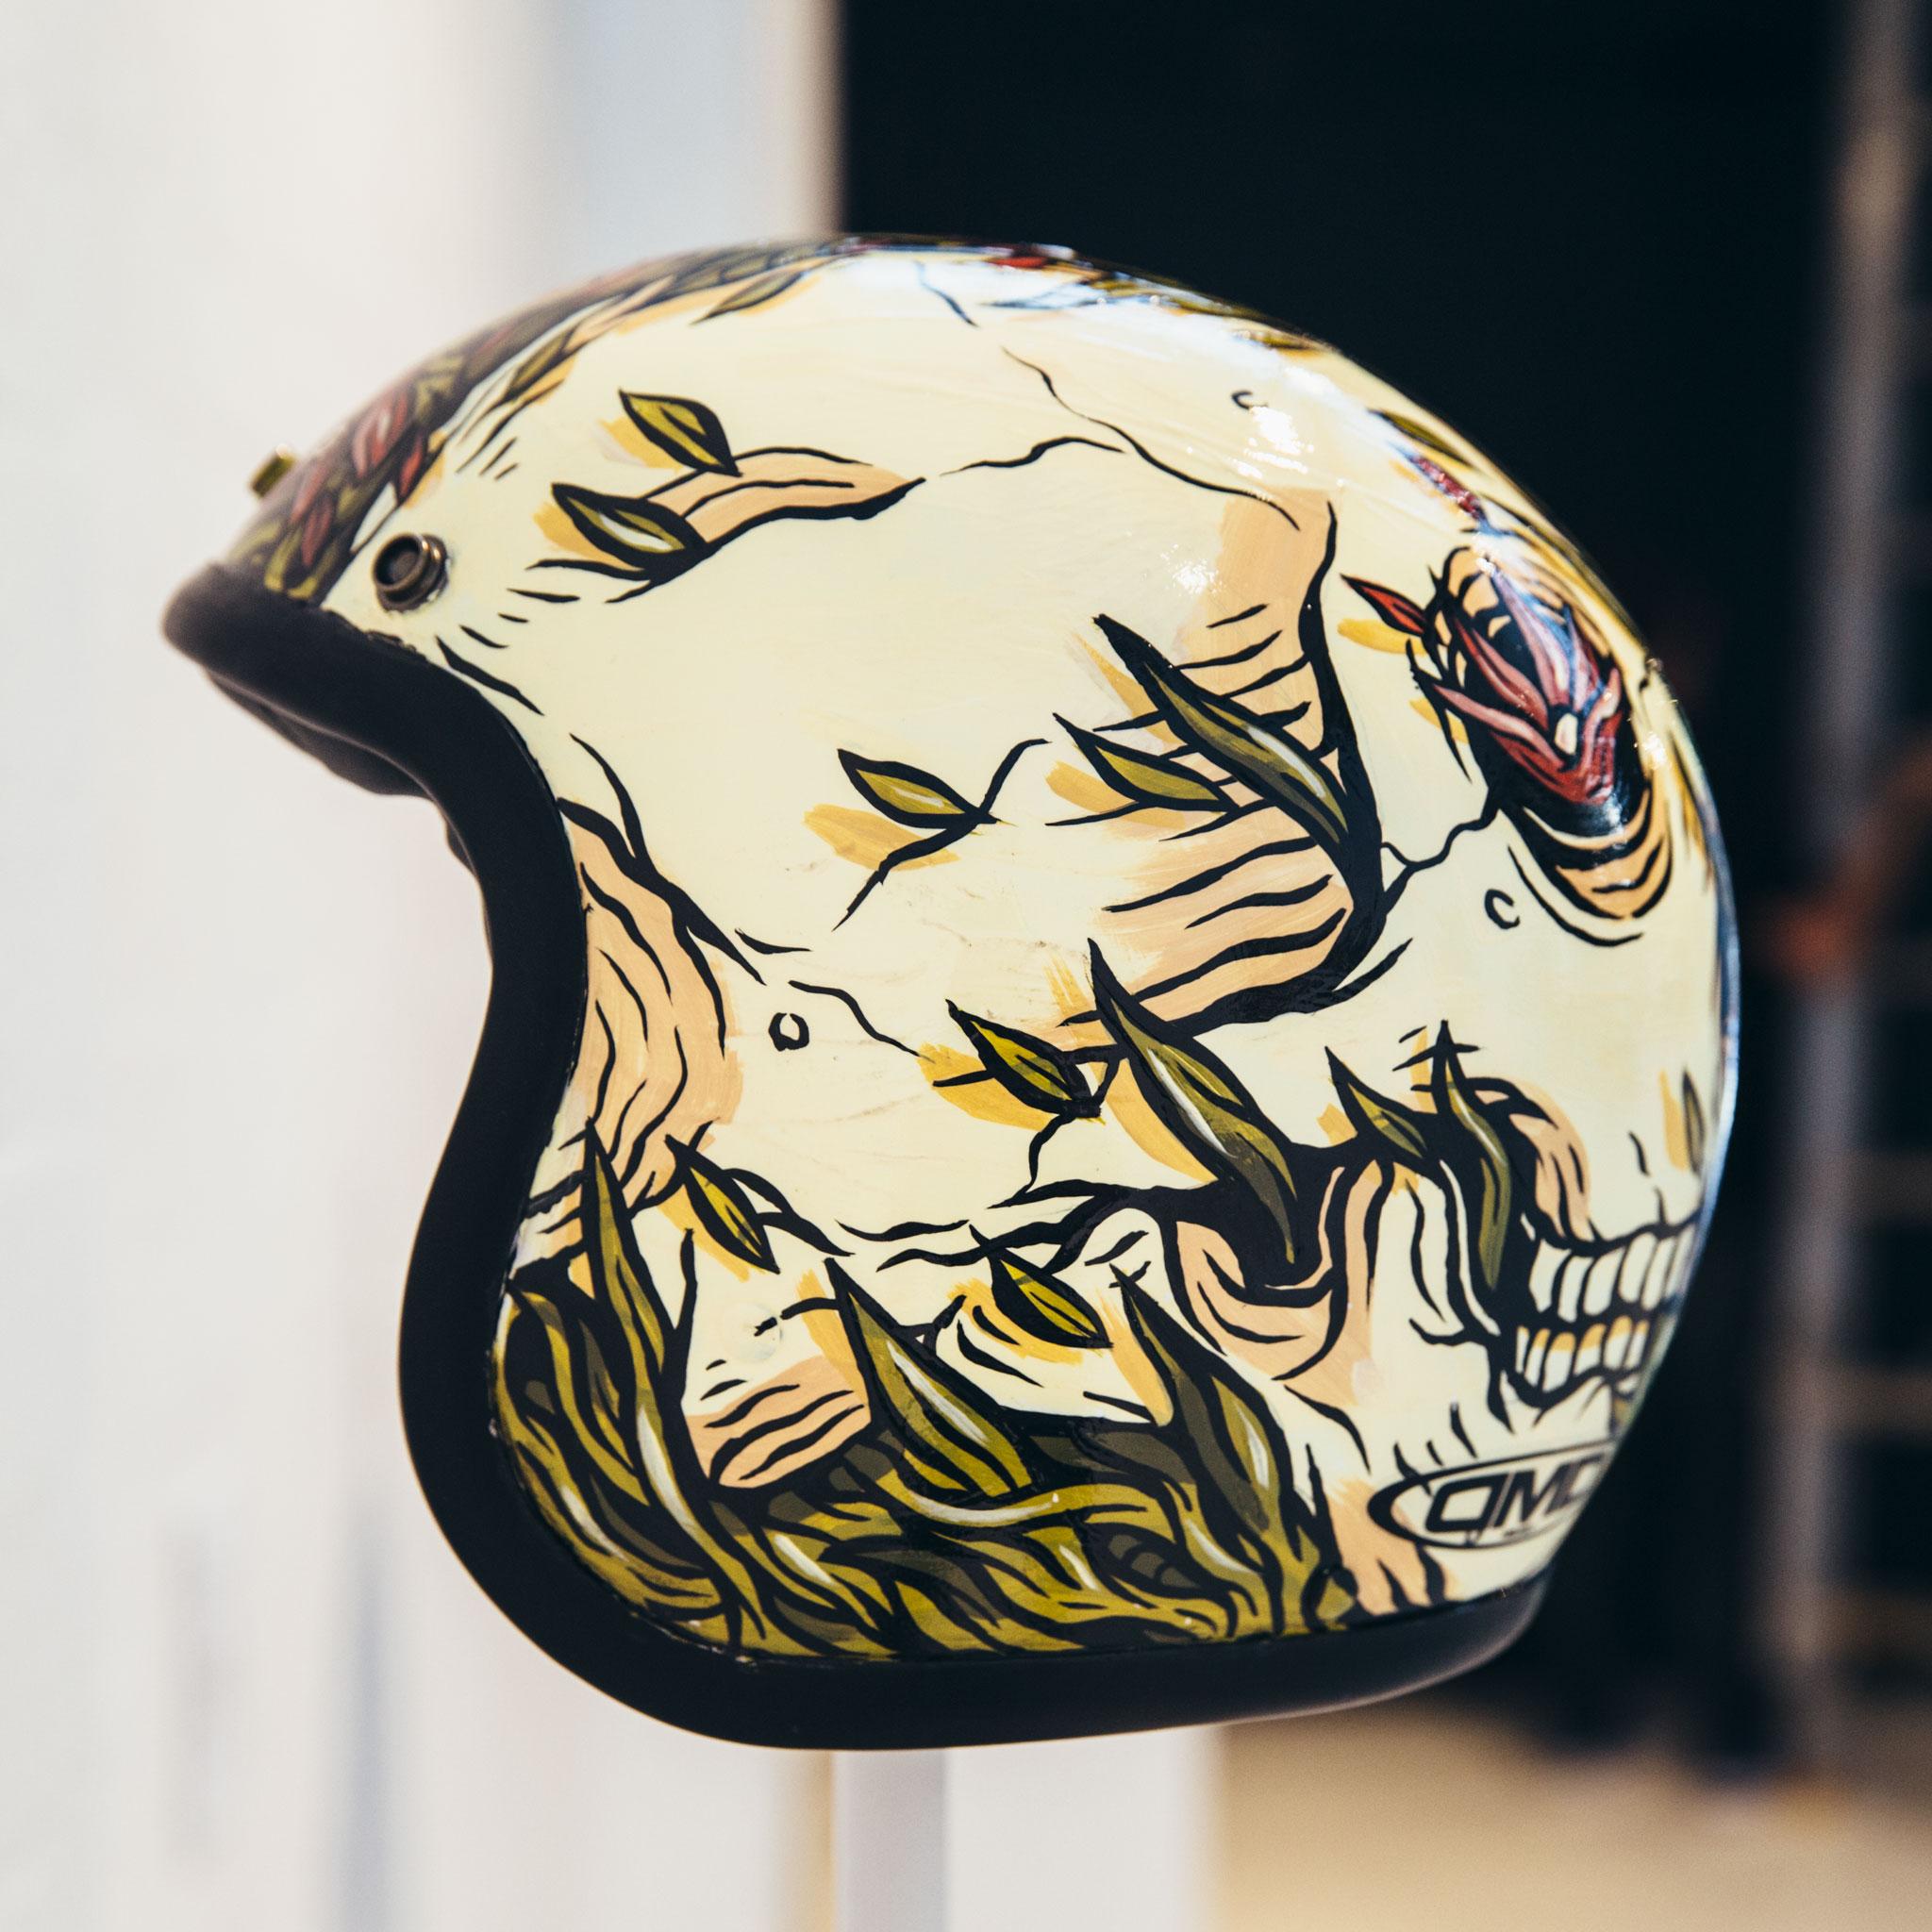 Art Pharamacy_Vandal Gallery_Sabotage MotorcyclesTwenty20_exhibition_5449.jpg